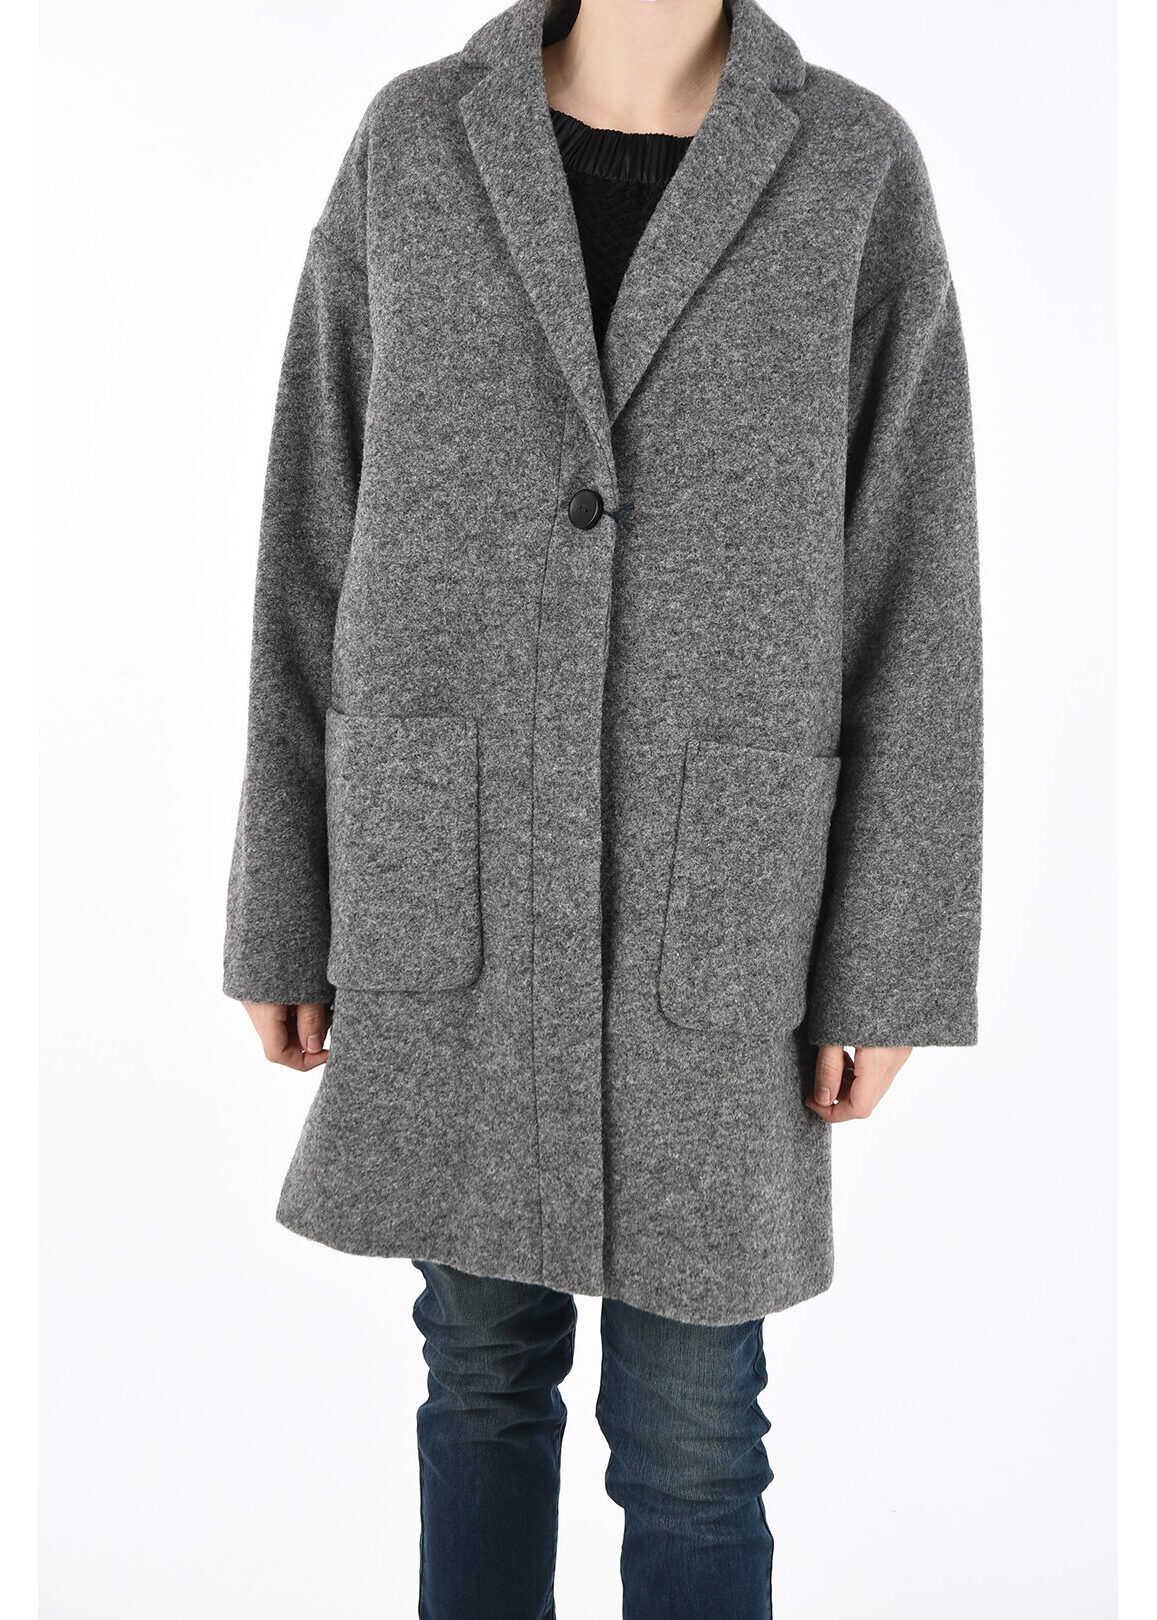 Armani ARMANI JEANS Wool Blend Single Breasted Coat GRAY